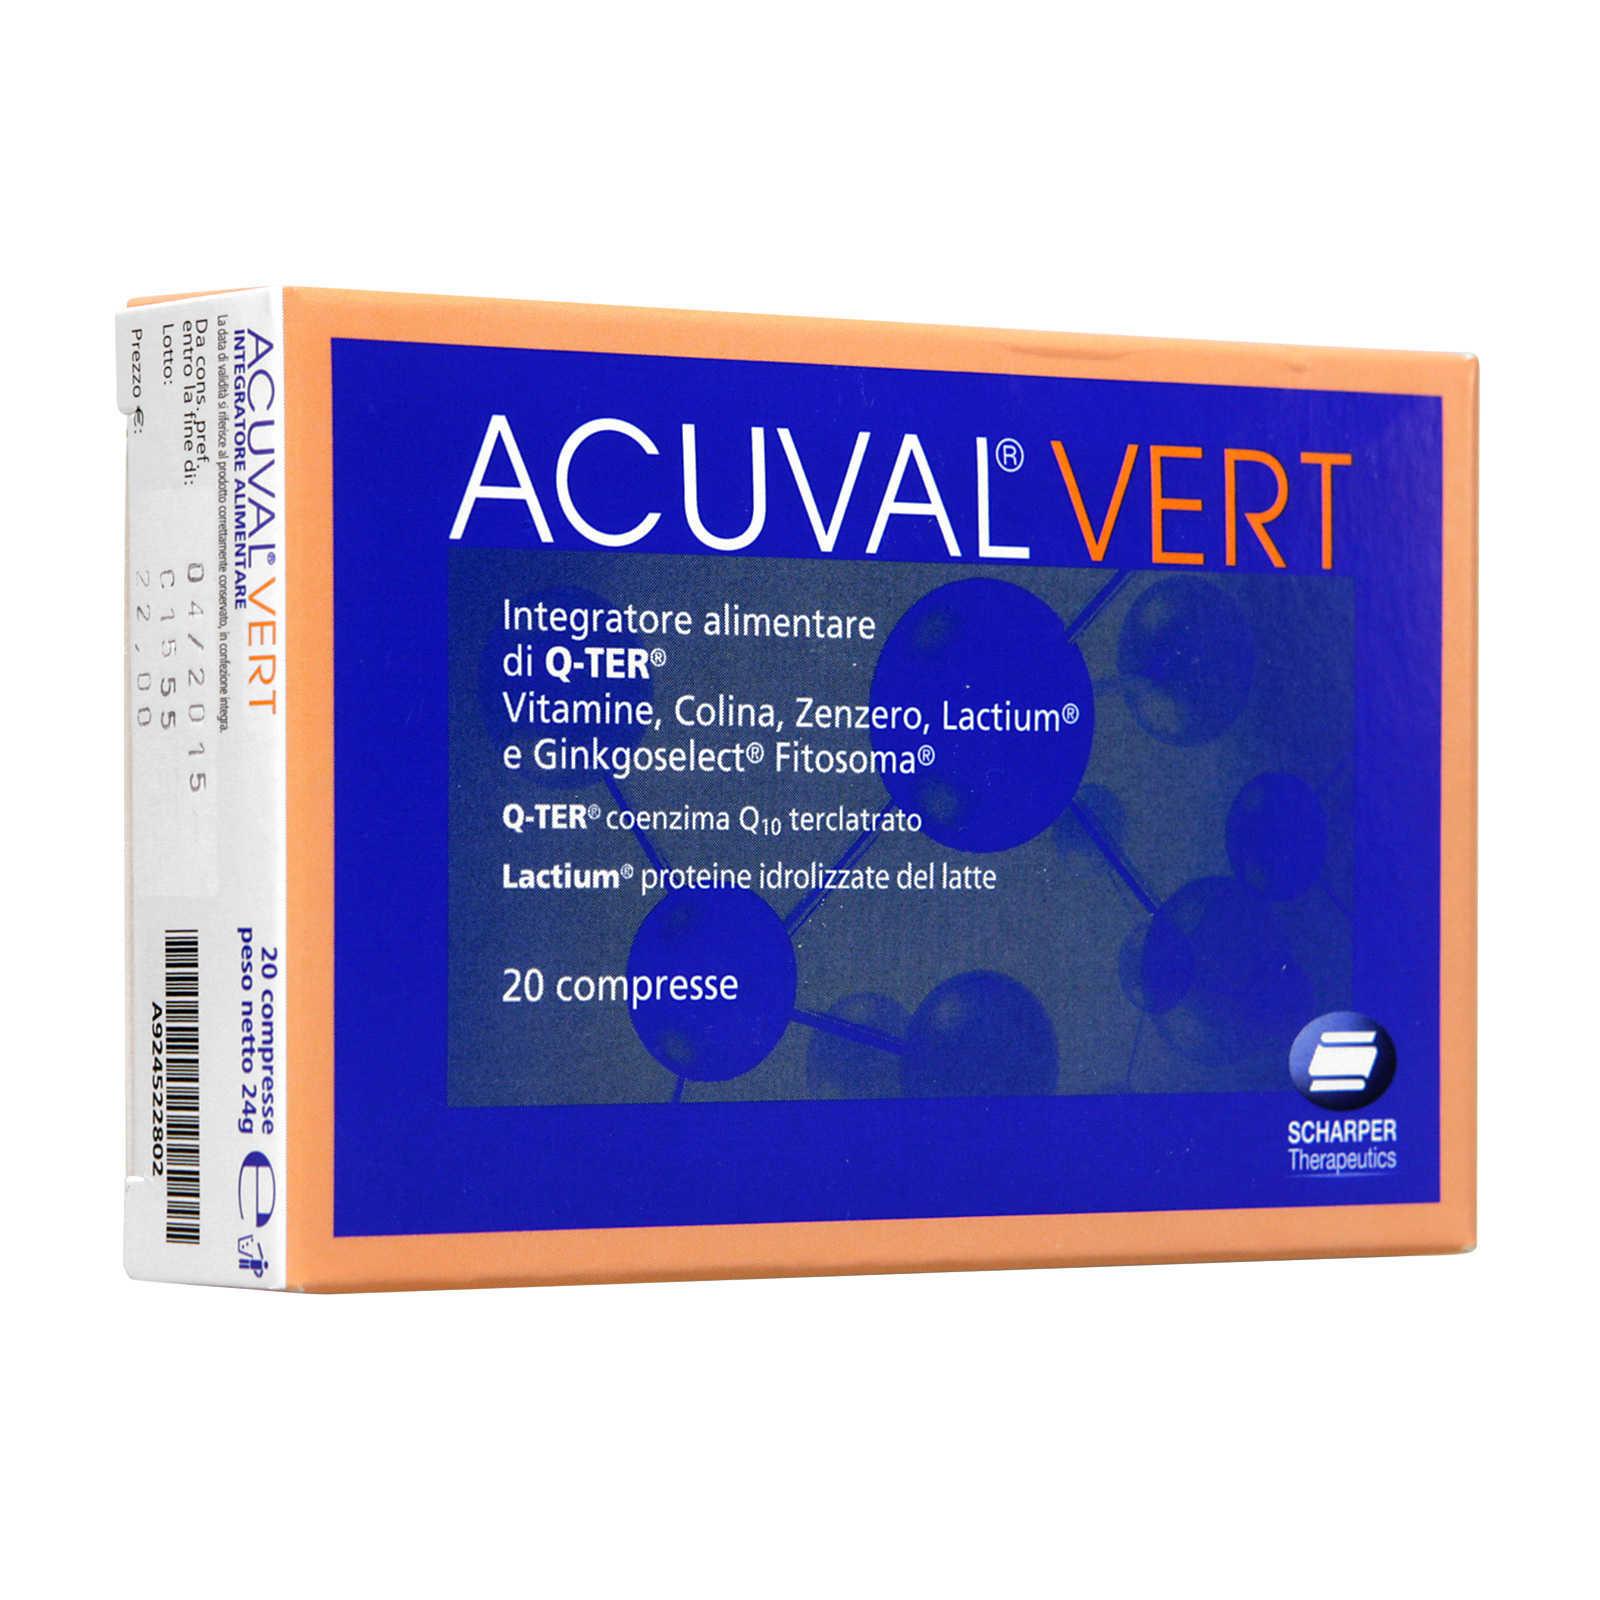 Acuval - Vert